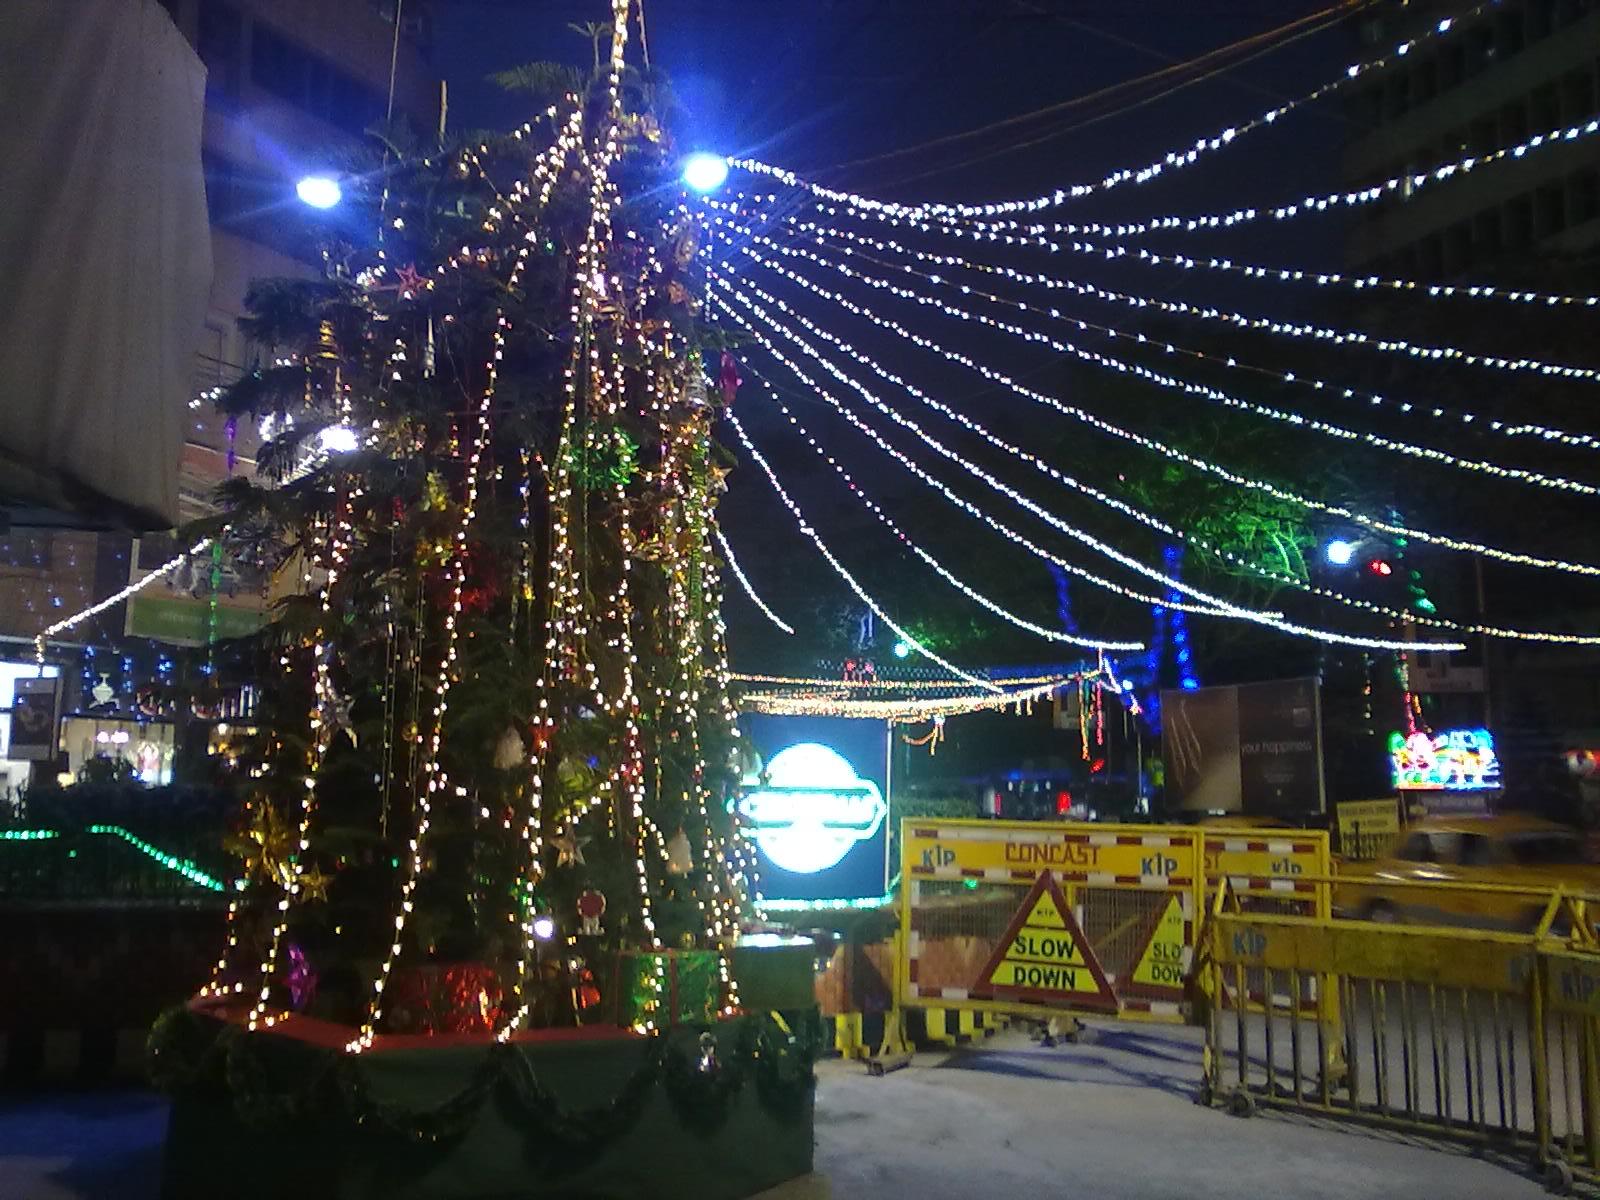 Park Street Kolkata During Christmas.File Christmas Lights Park Street Kolkata 8 Jpg Wikimedia